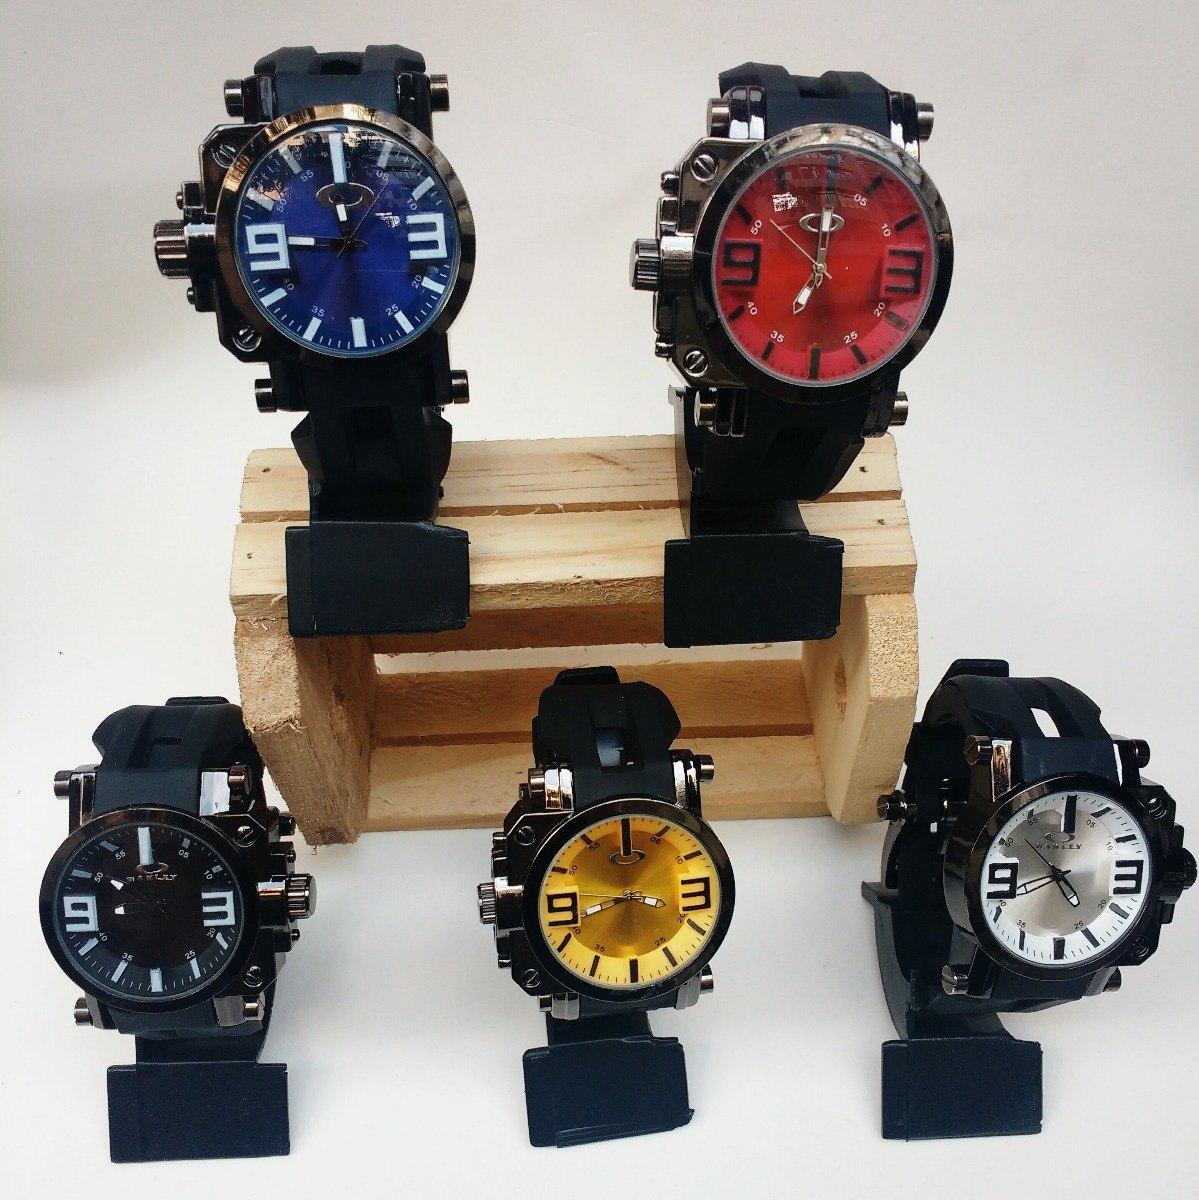 Kit Revenda 3 Relógios Oakley Gearbox Titanium Masculinos - R  120 ... 9b66949bc9